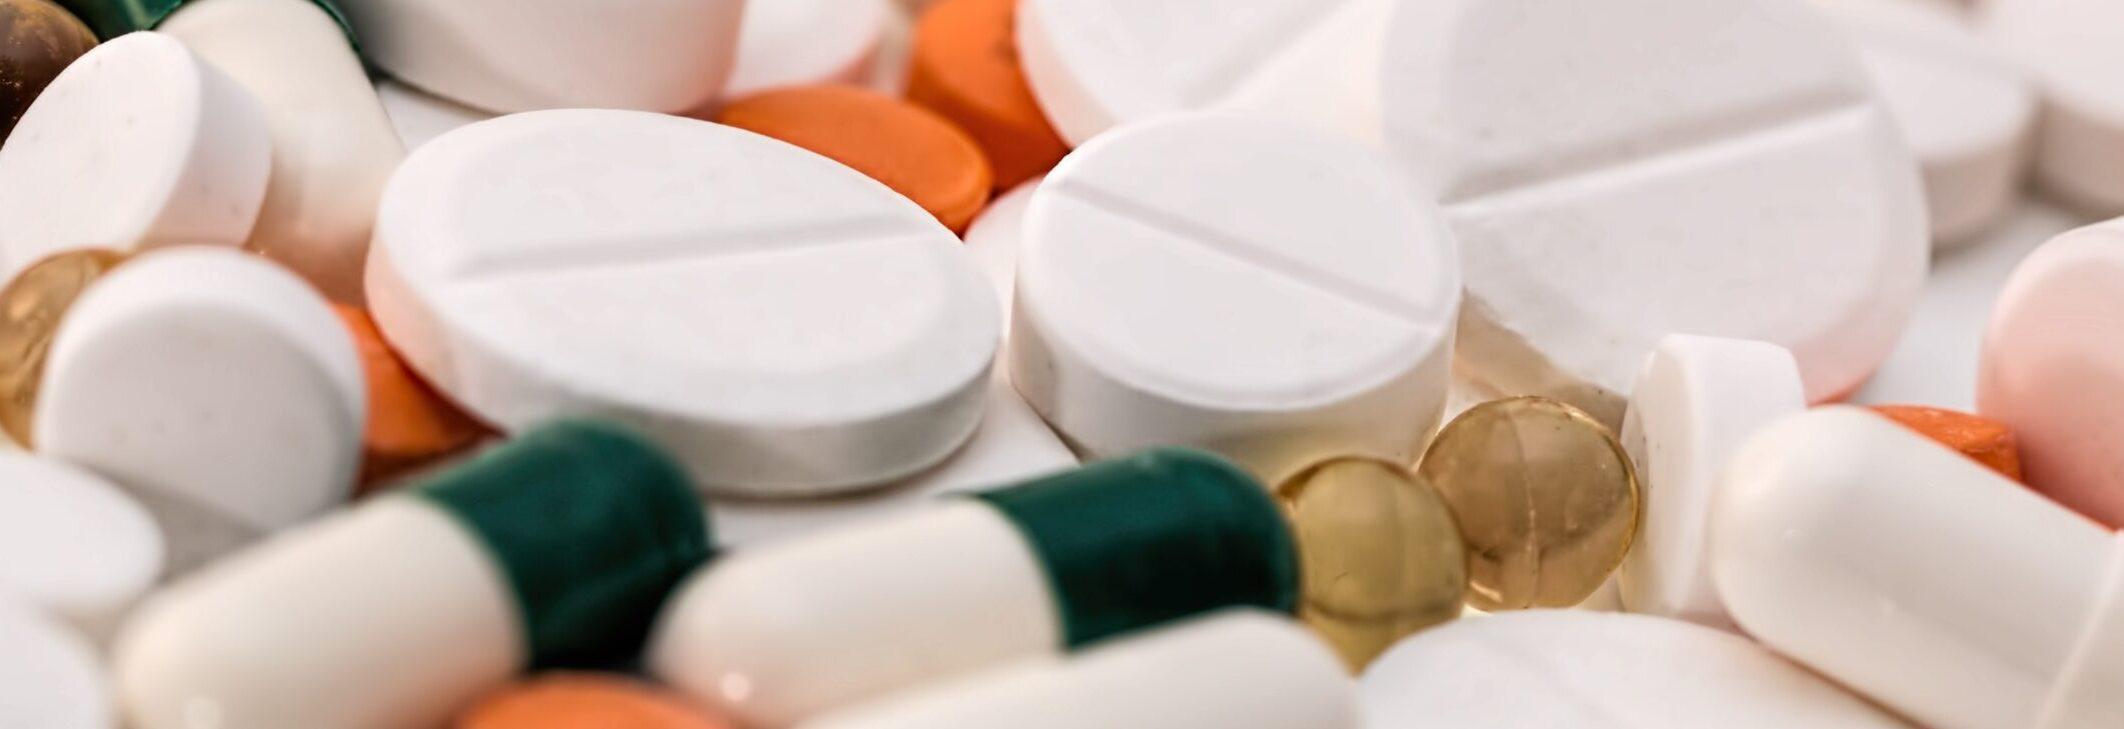 Pile Pills